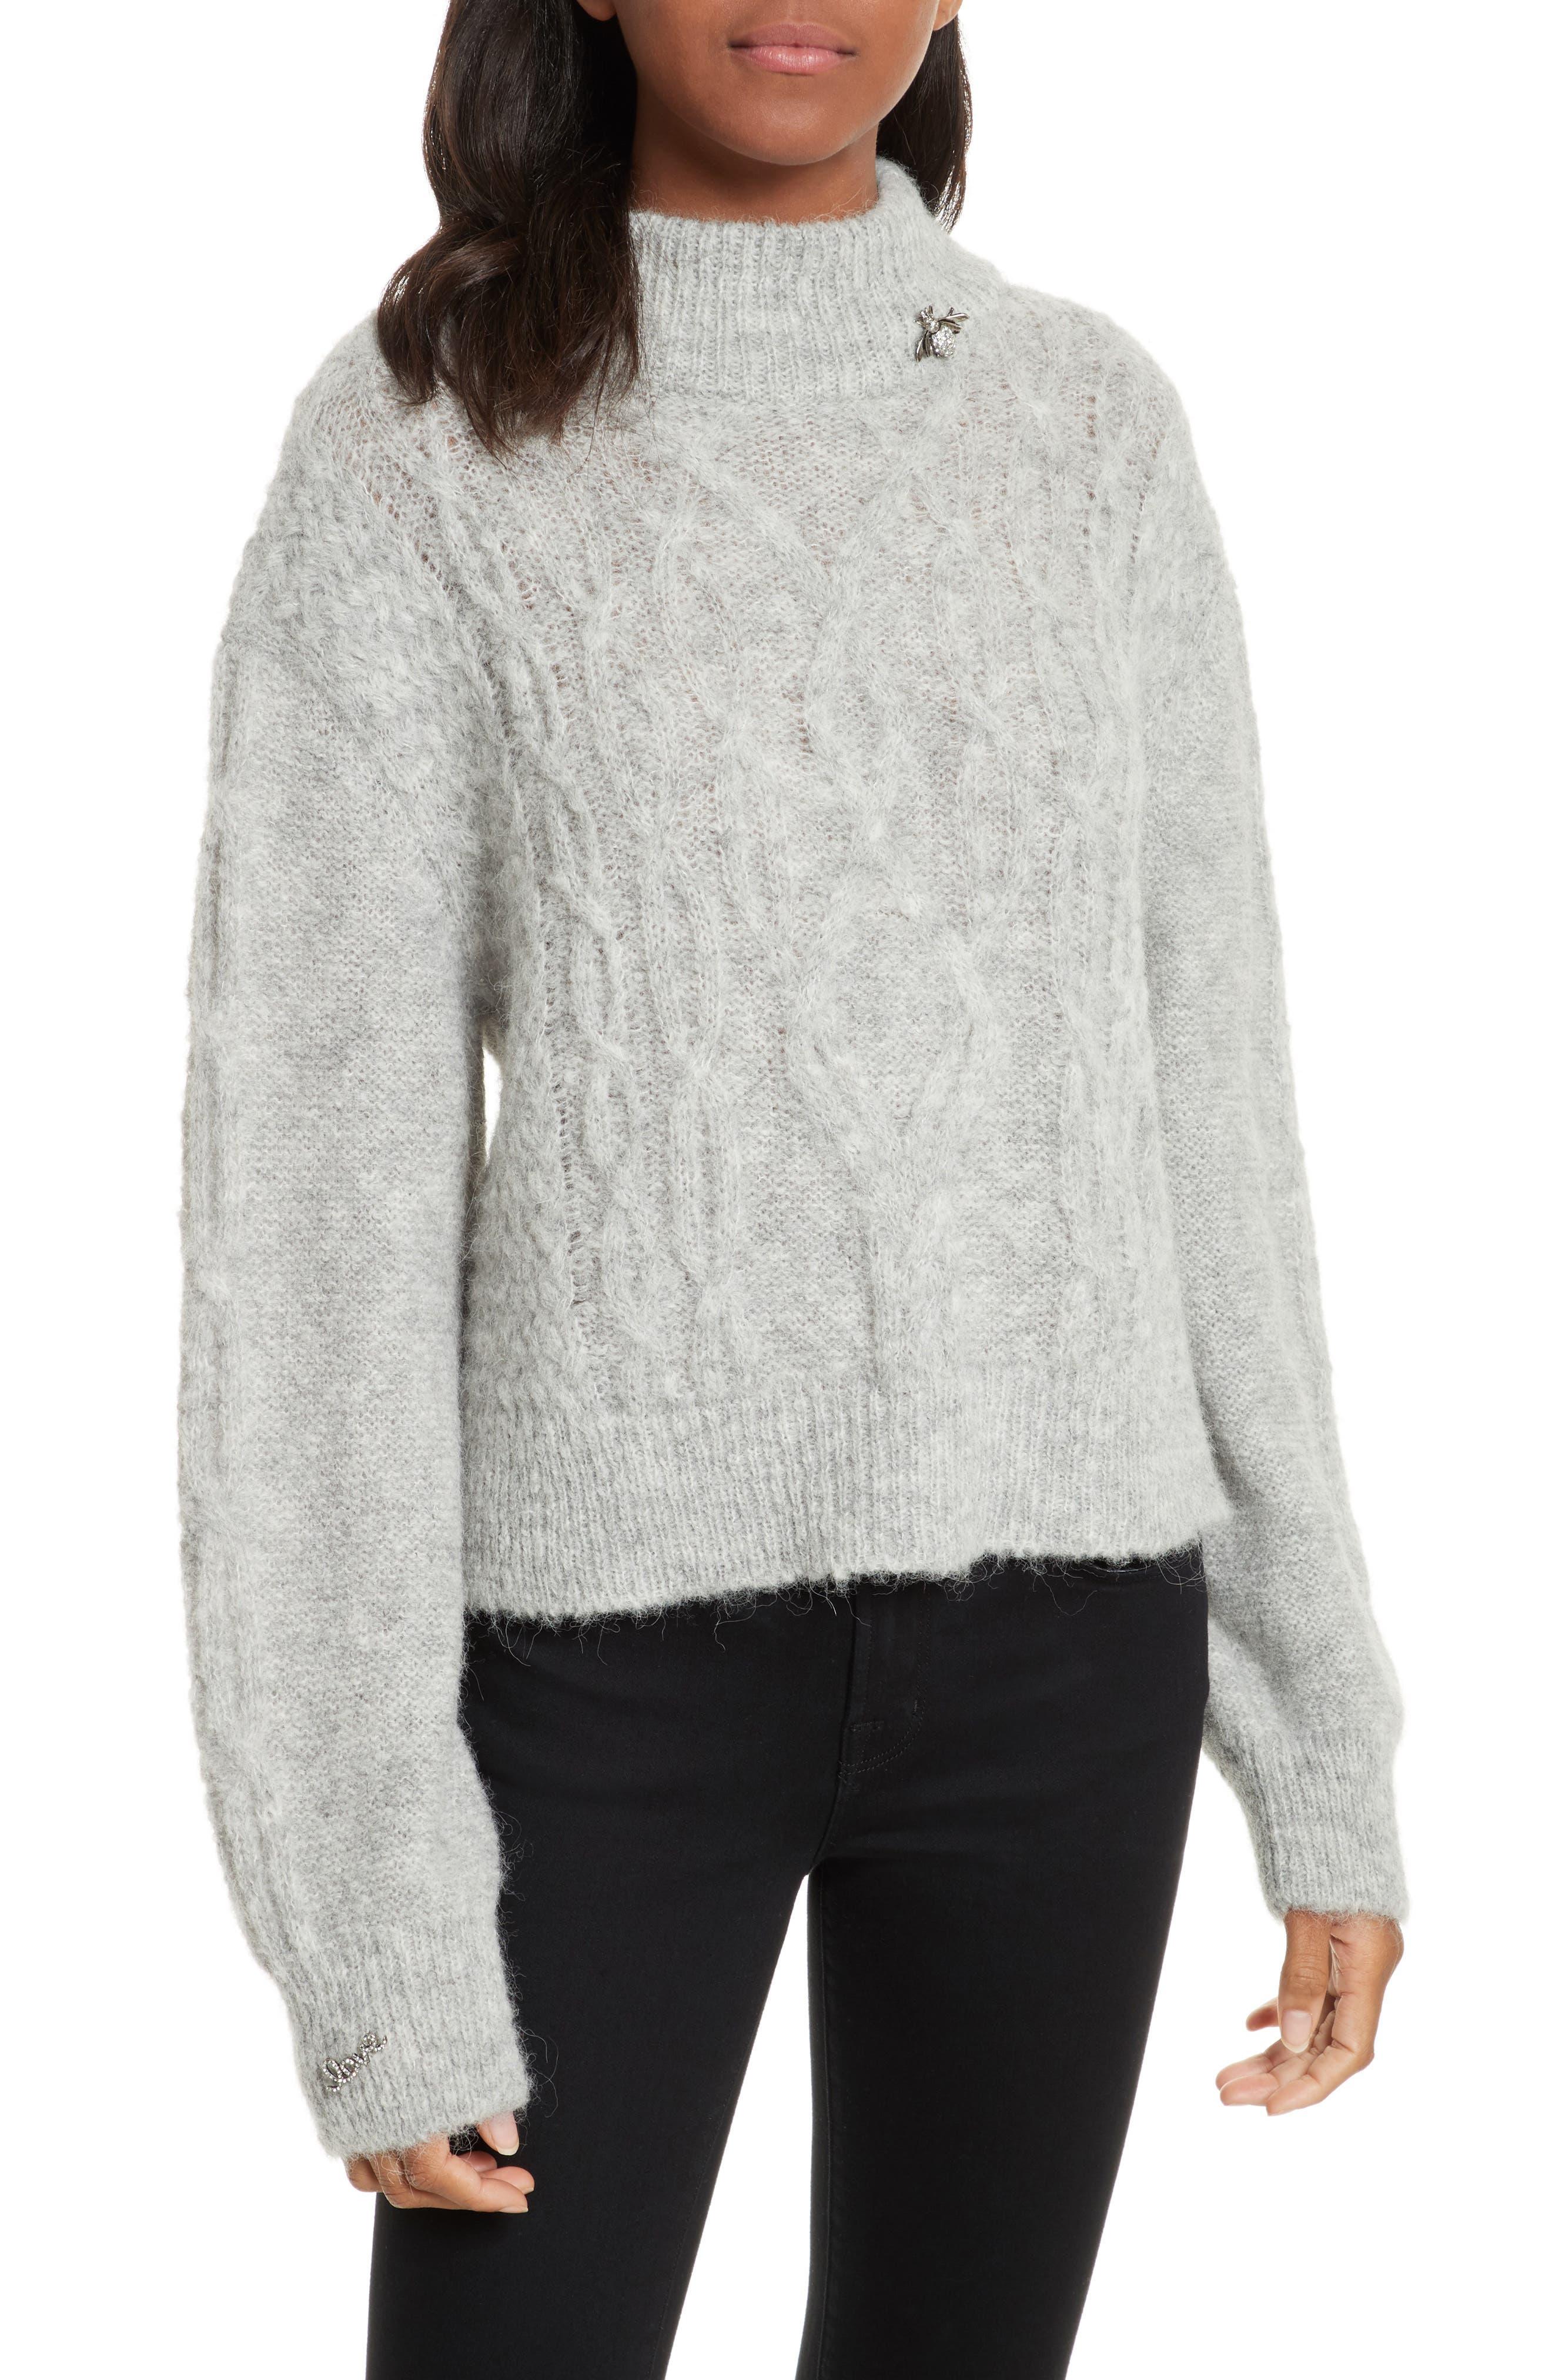 Garlan Mock Neck Sweater,                             Main thumbnail 1, color,                             Light Heather Grey